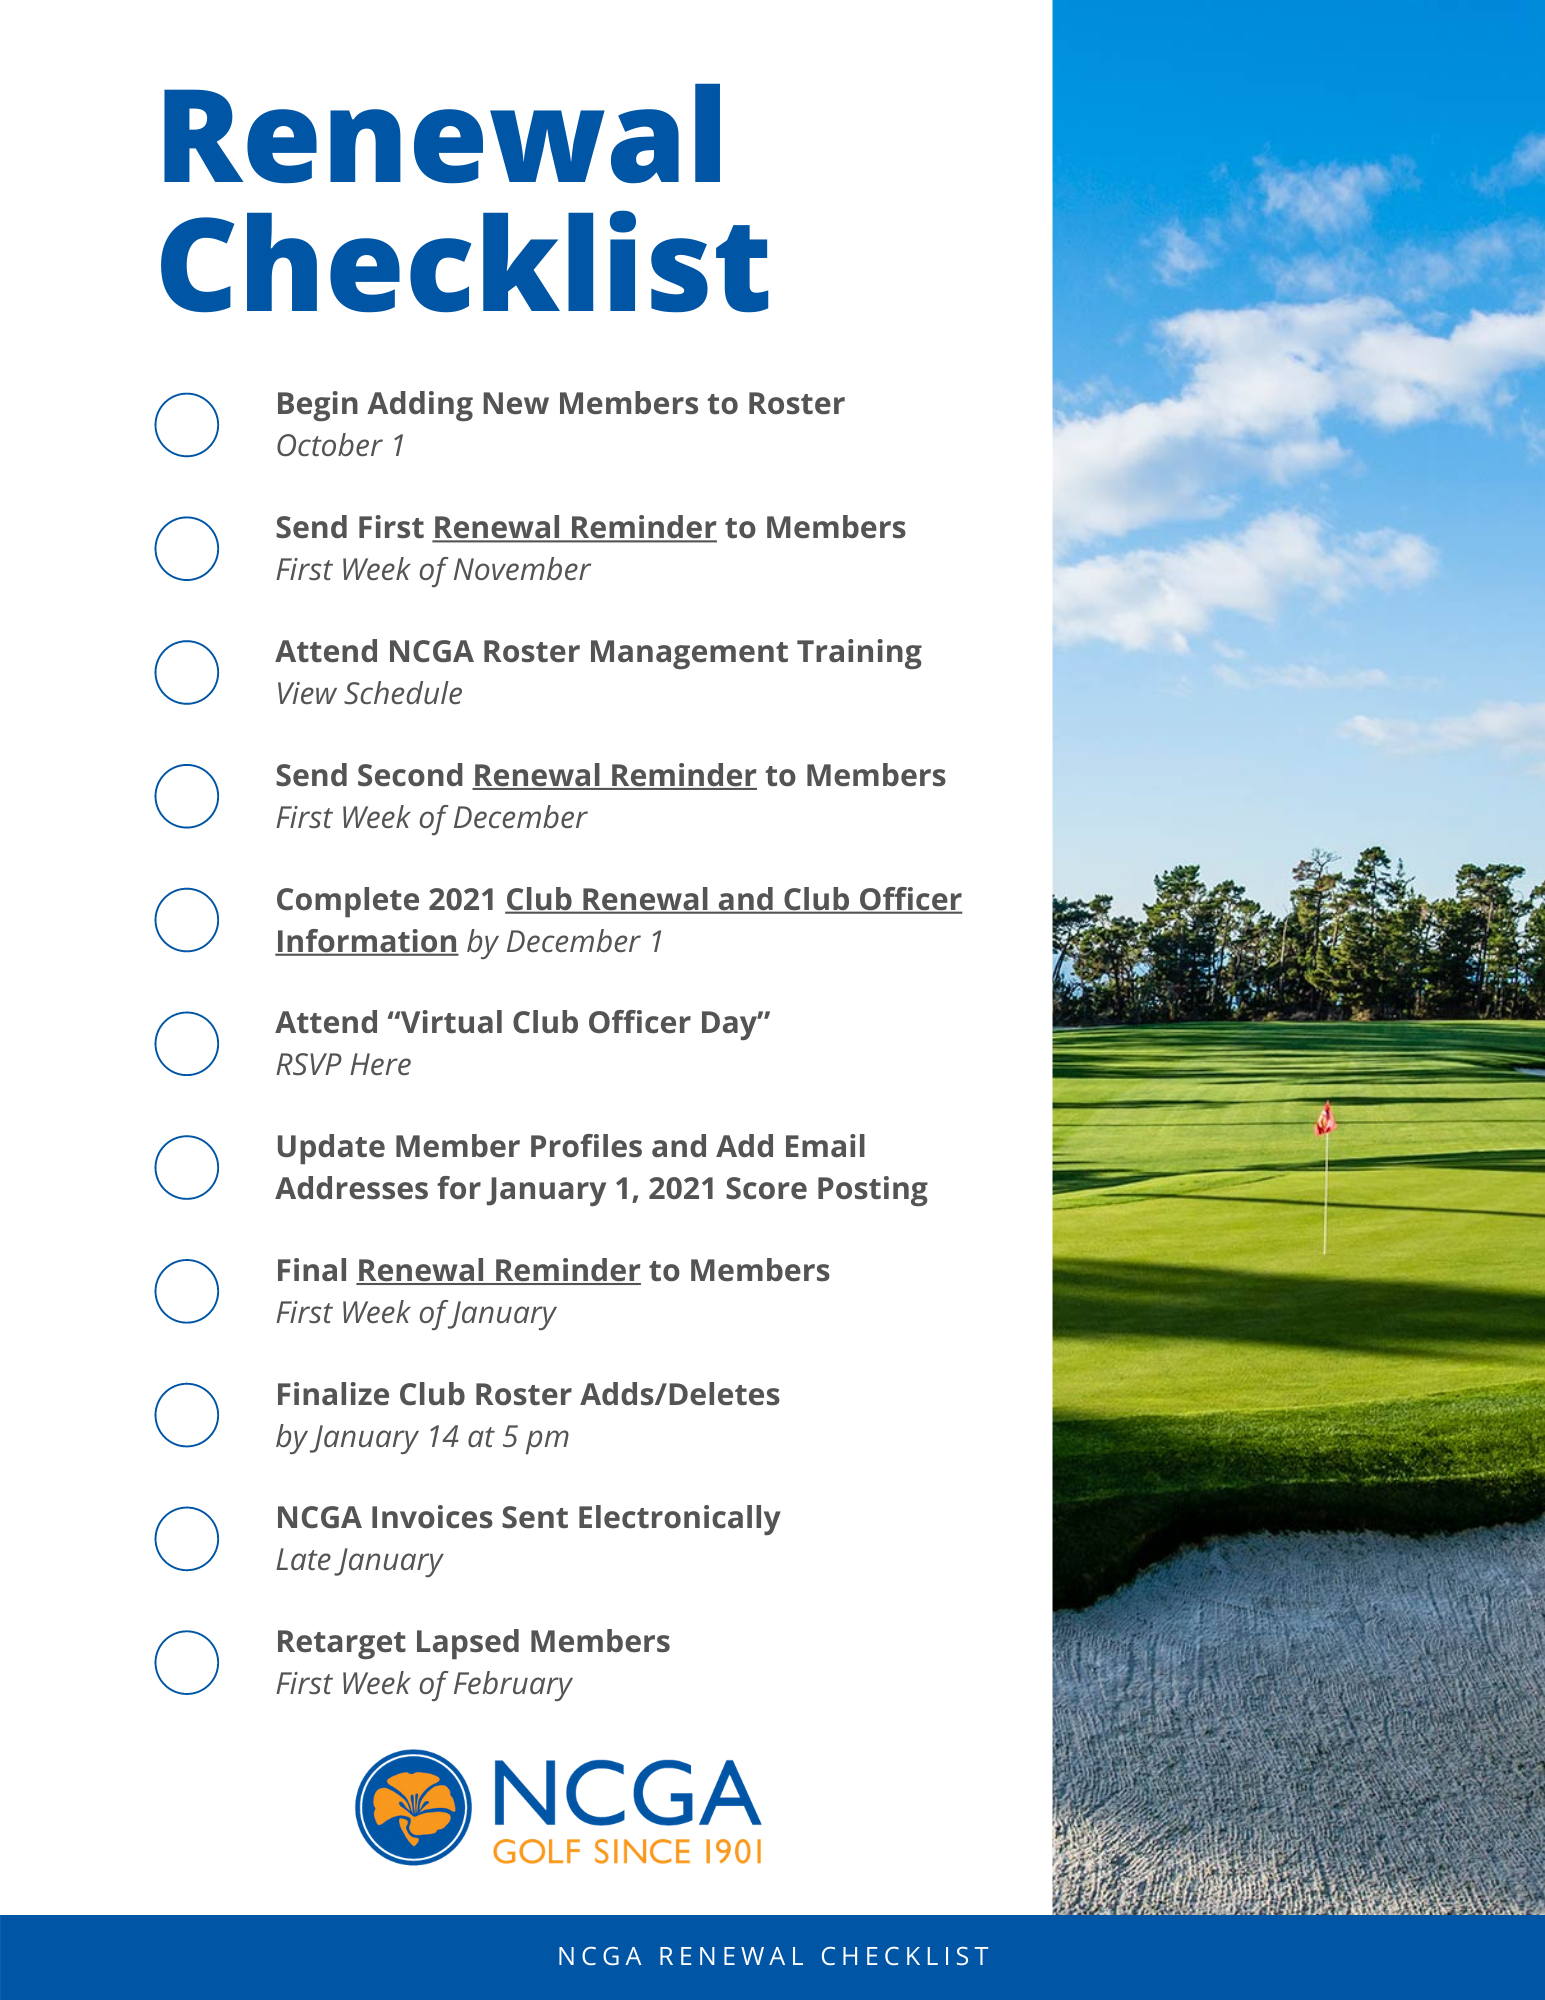 NCGA Renewal Checklist